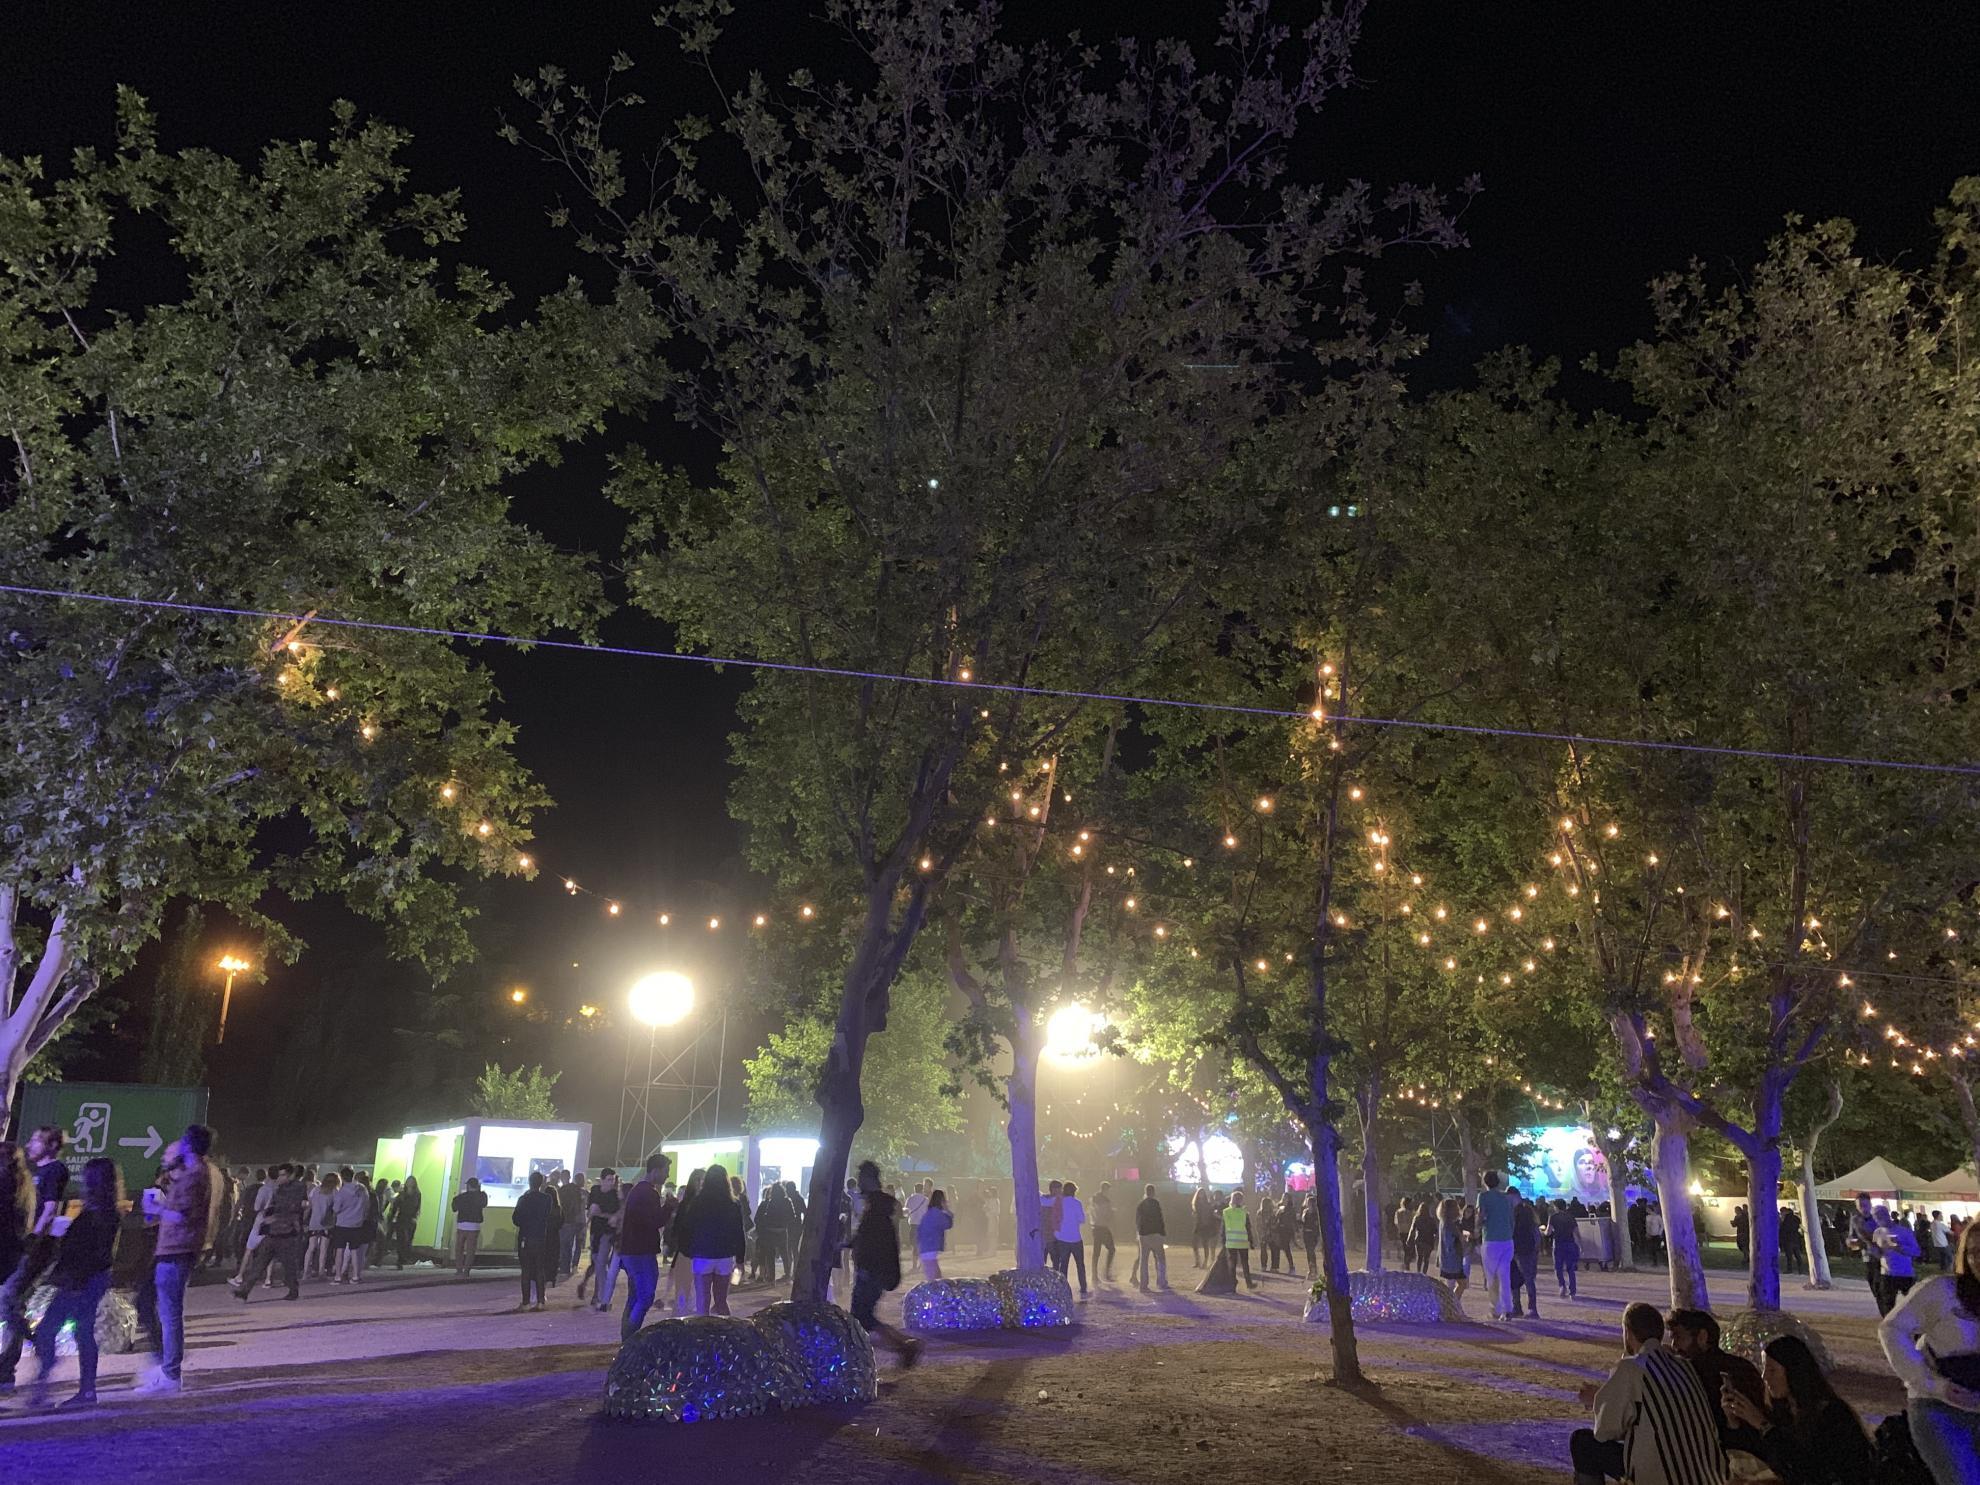 Asistentes Paraíso Festival 2019 by Fanmusicfest